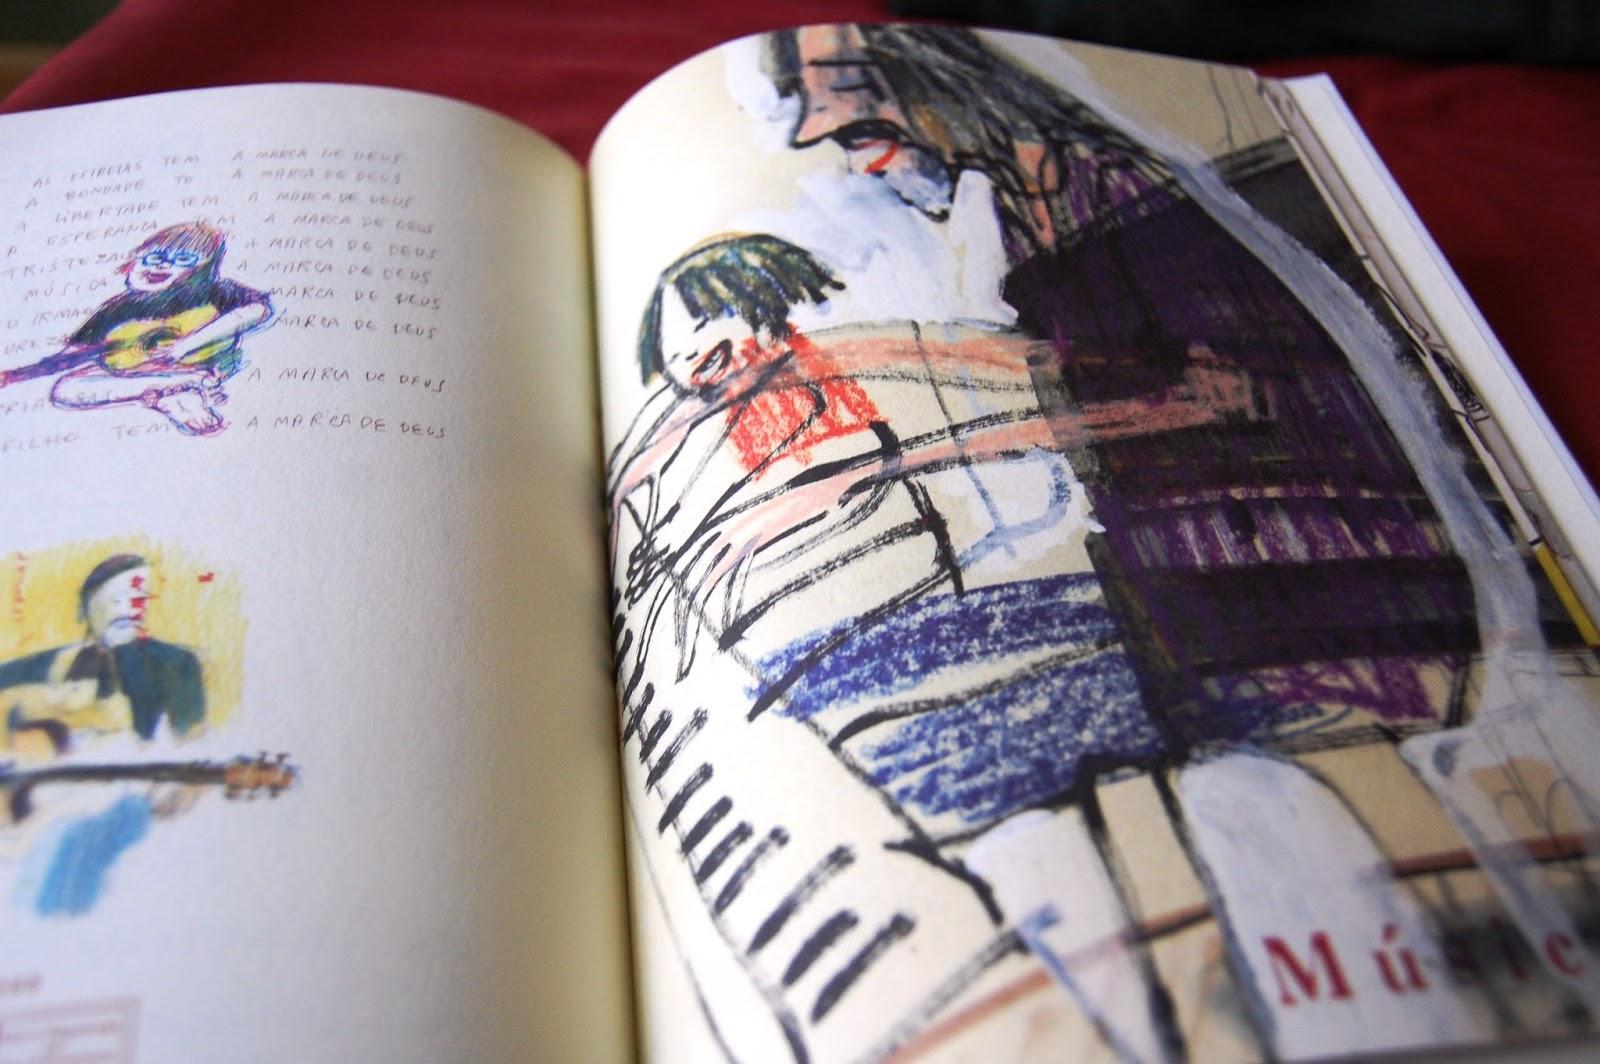 082556fd2 anatarambana literatura infantil: Mallko y papá, de Gusti: una vida ...